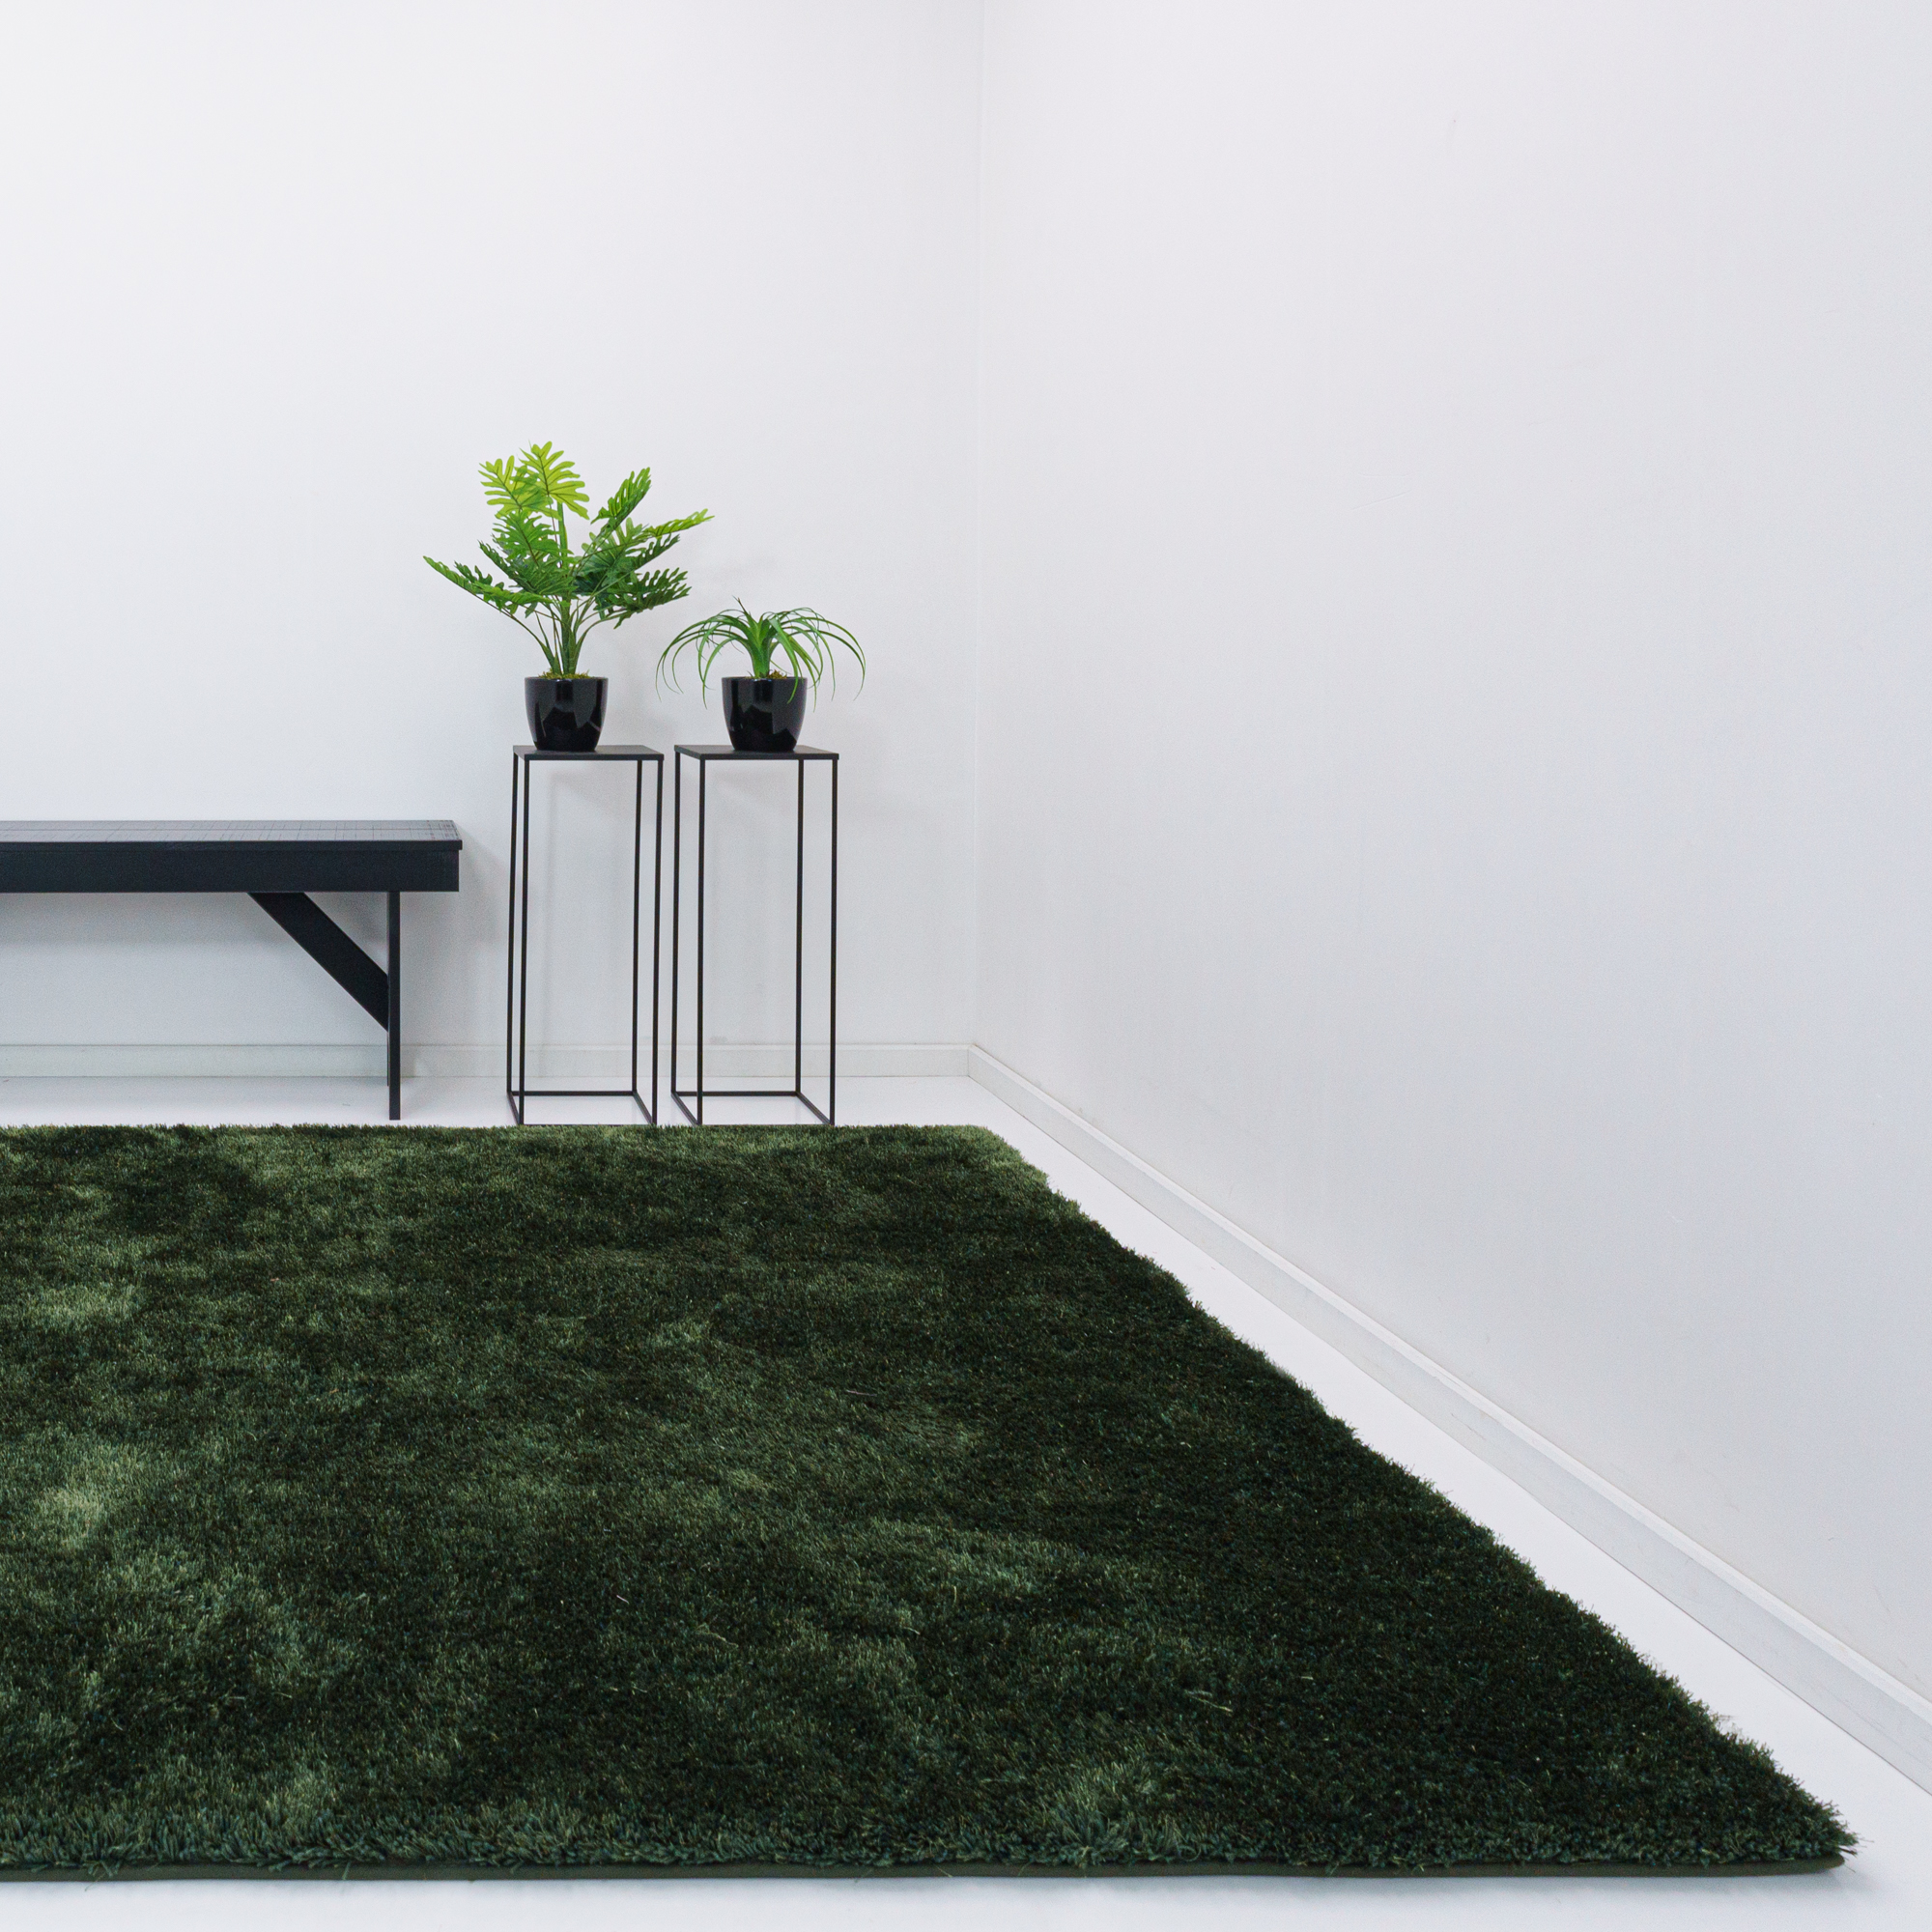 Vloerkleed Xilento Twinkle Mossgreen | 170 x 230 cm